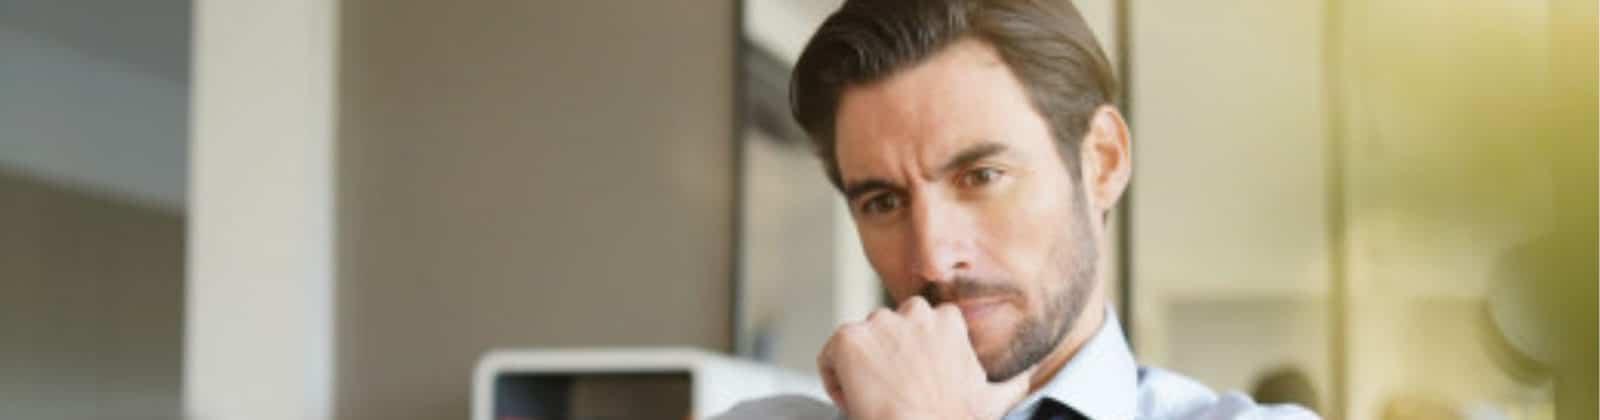 best 40s men hairstyle